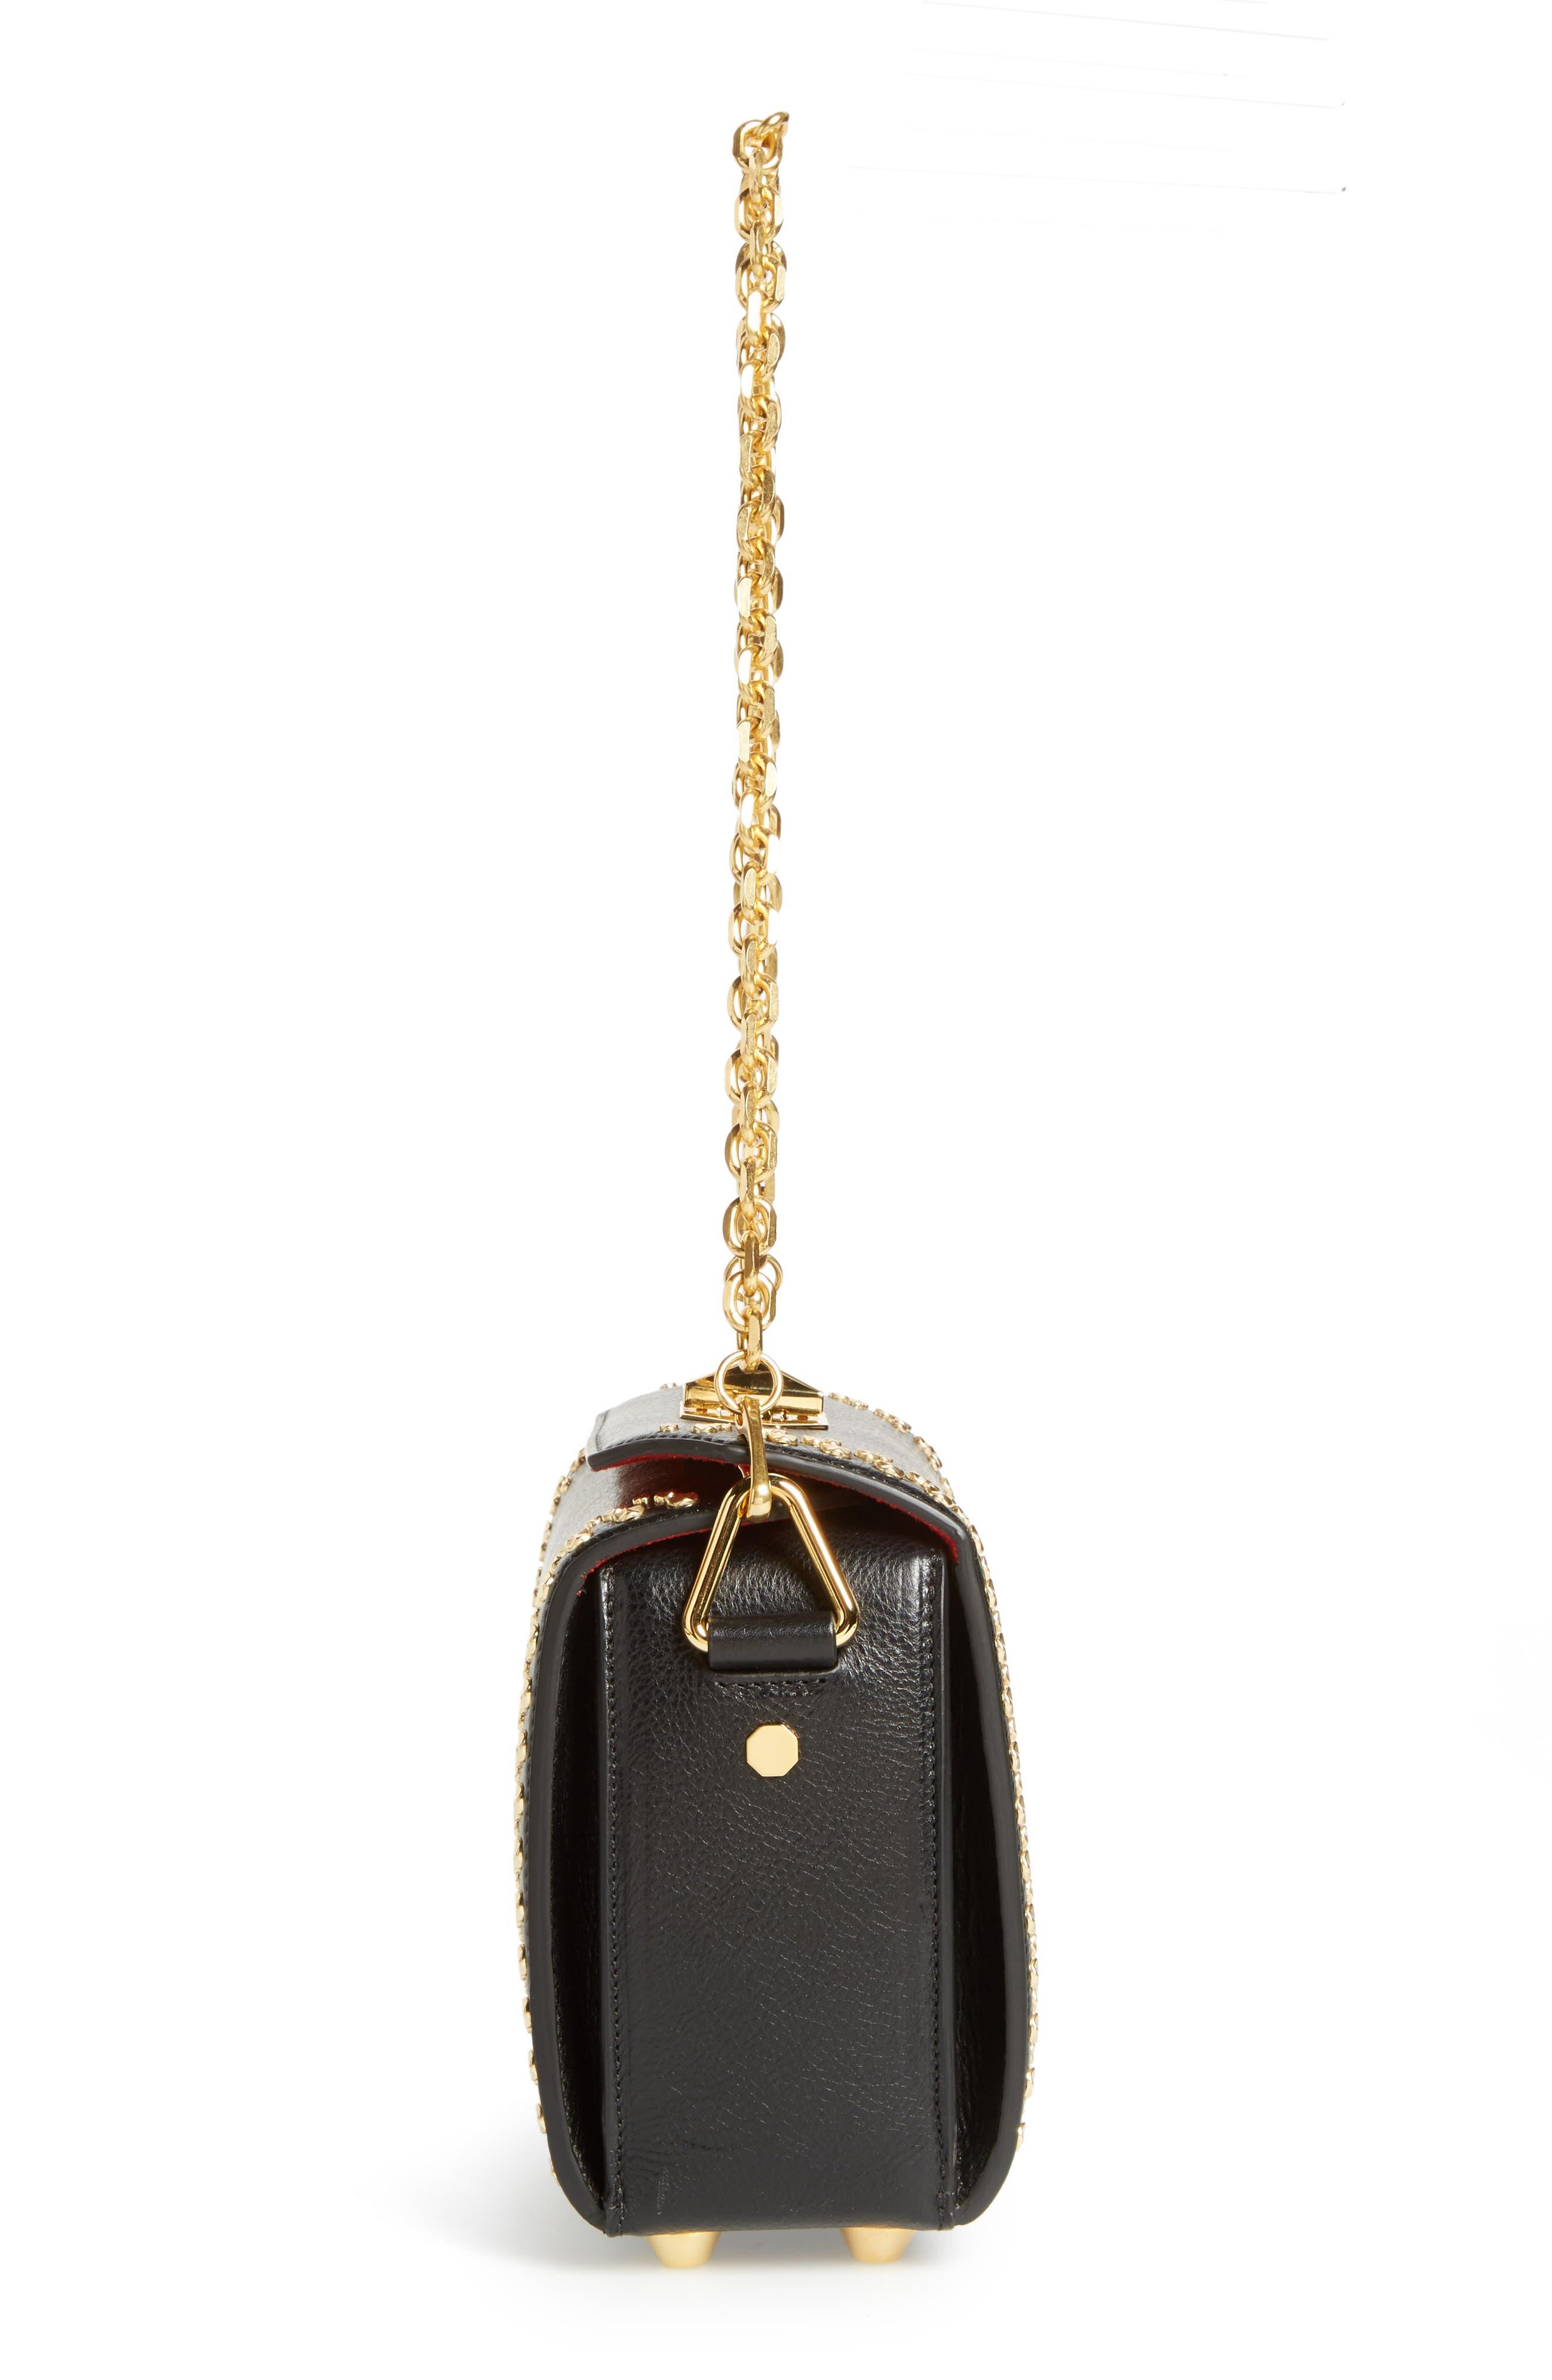 Box Bag 19 Studded Leather Bag,                             Alternate thumbnail 6, color,                             BLACK